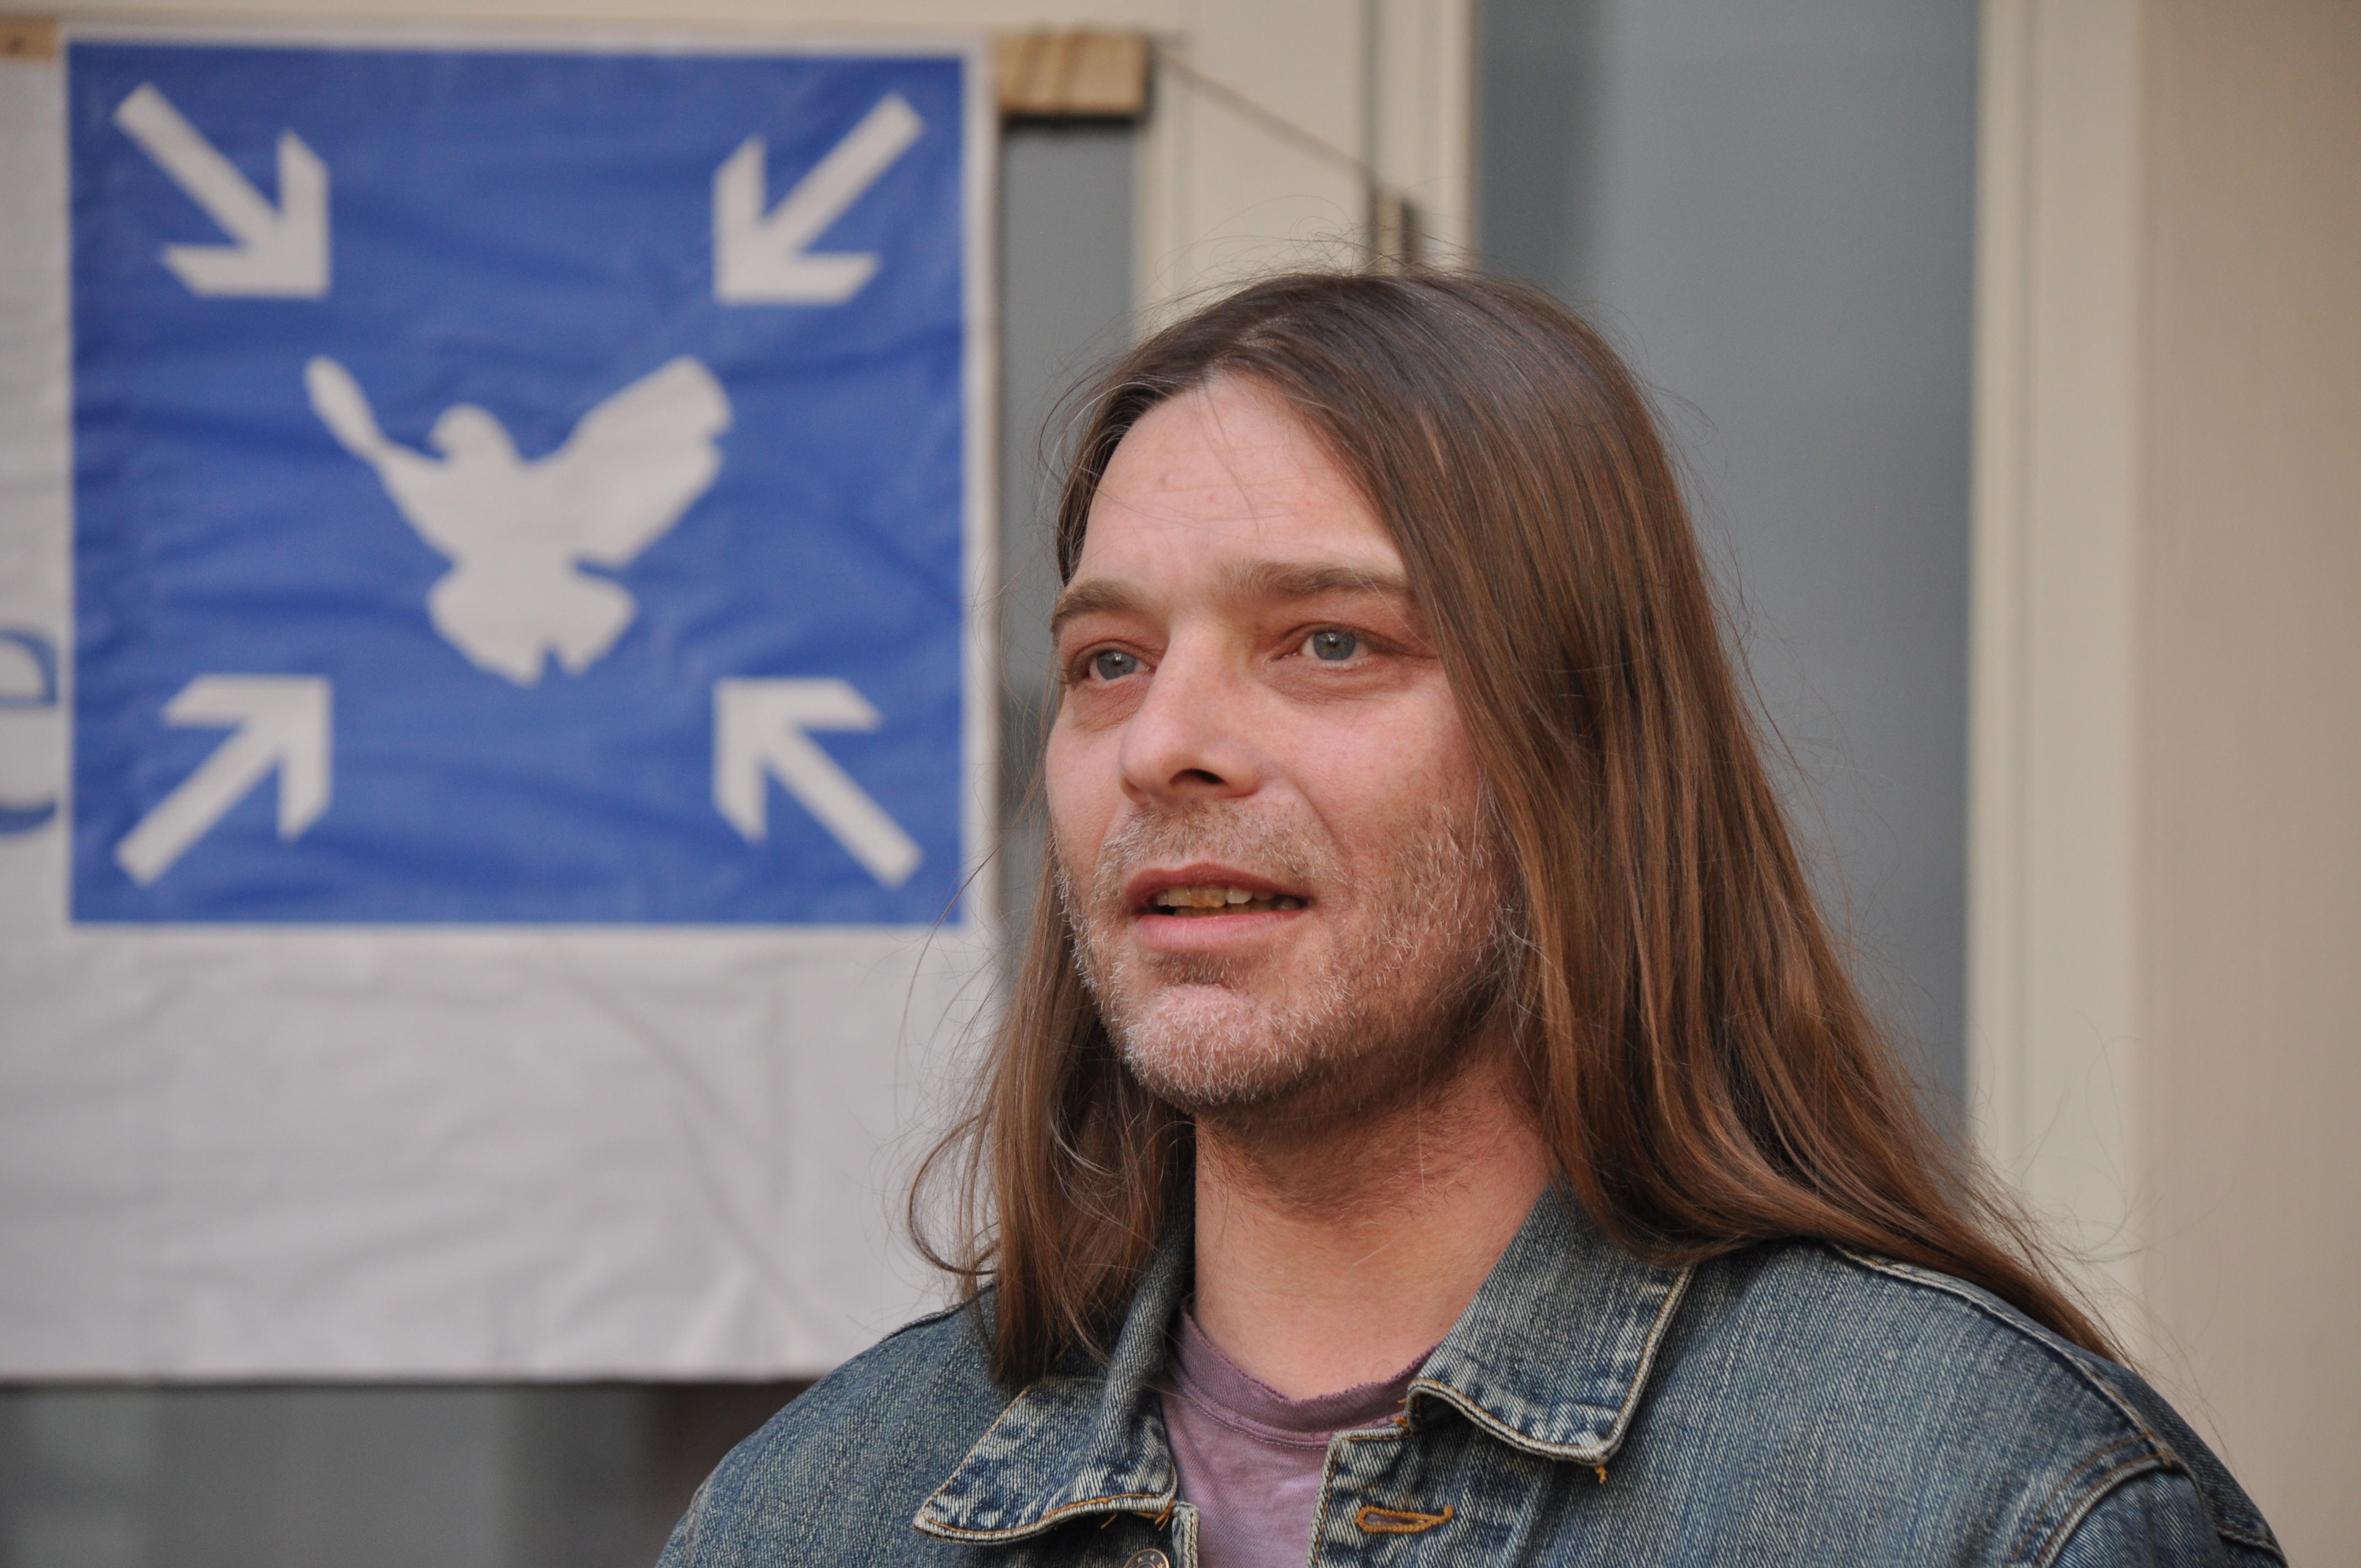 MontagsMahnwache Osnabrück, Dominik Edelmann, Mitinitiator, Ansprache  05.05.2014